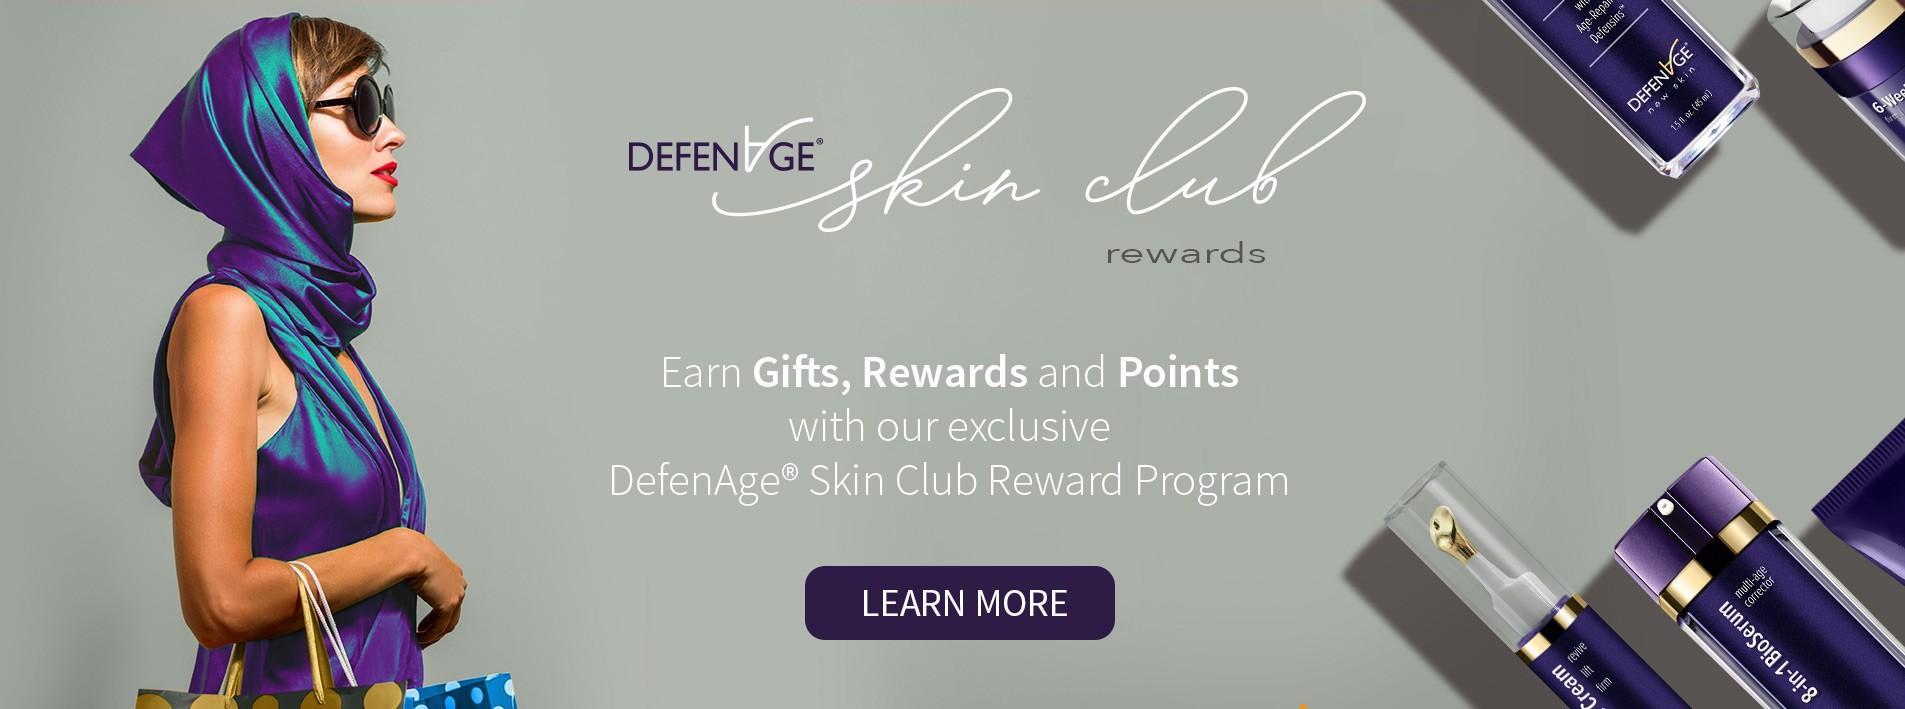 DEFENAGE REWARD PROGRAM